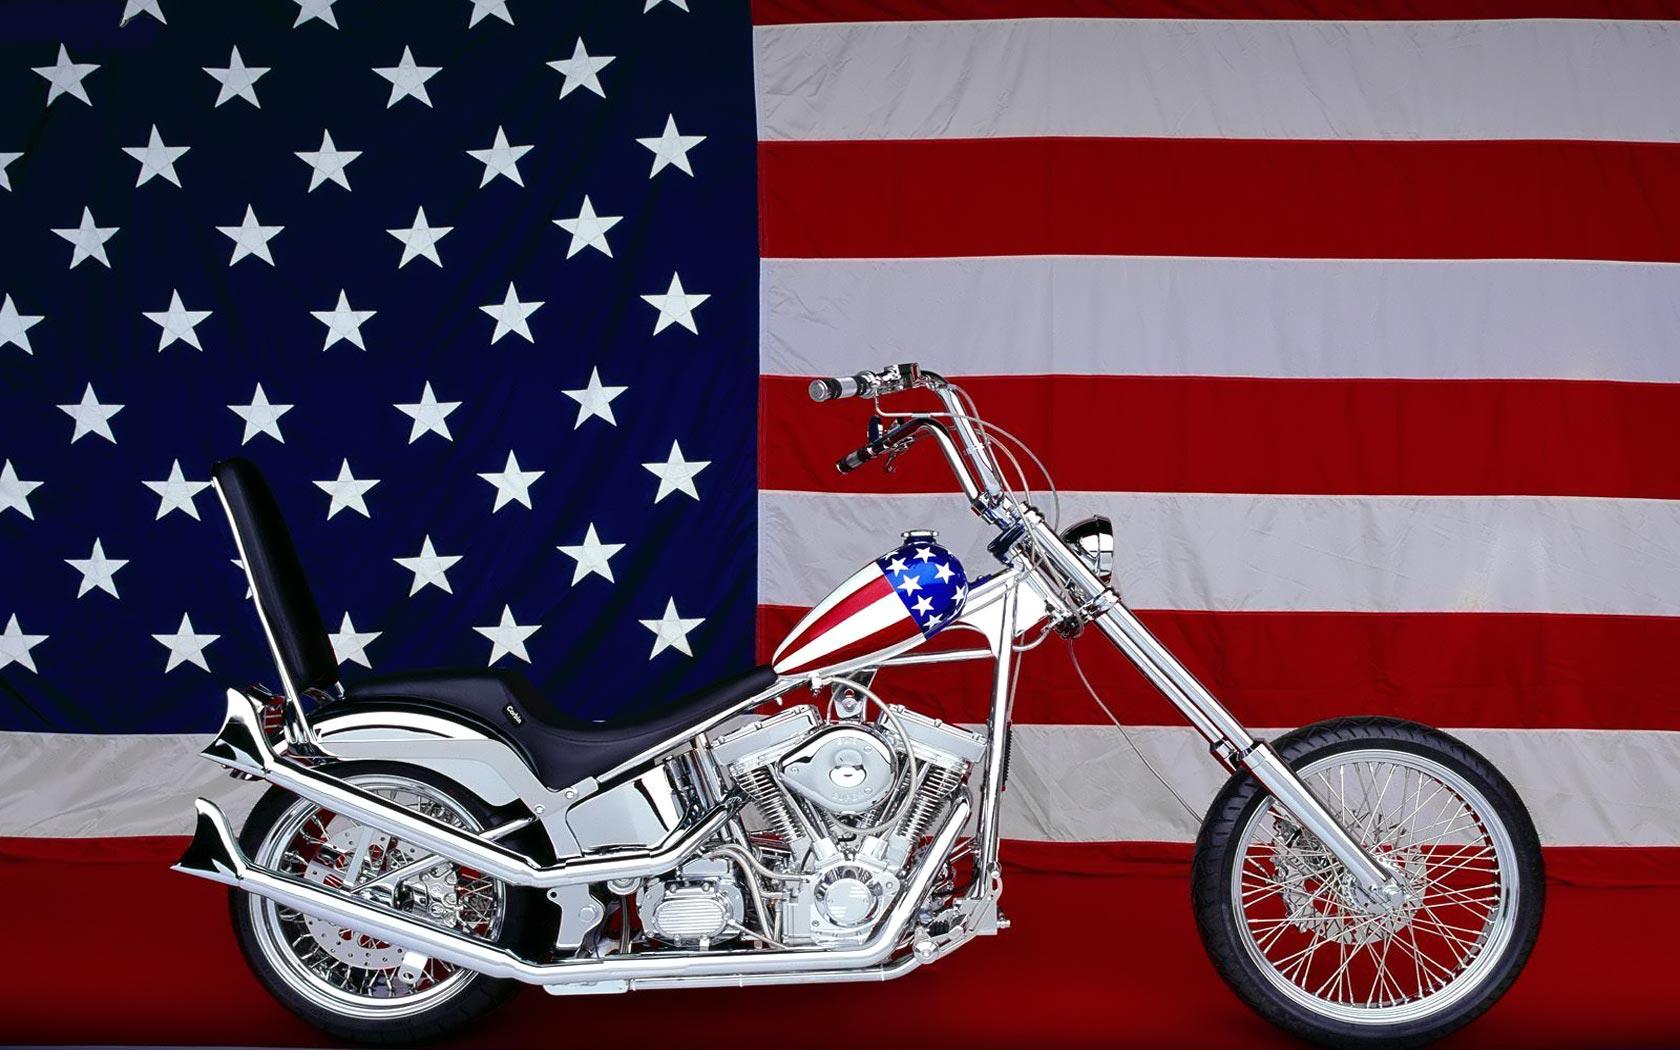 78 Harley Davidson Desktop Wallpaper On Wallpapersafari